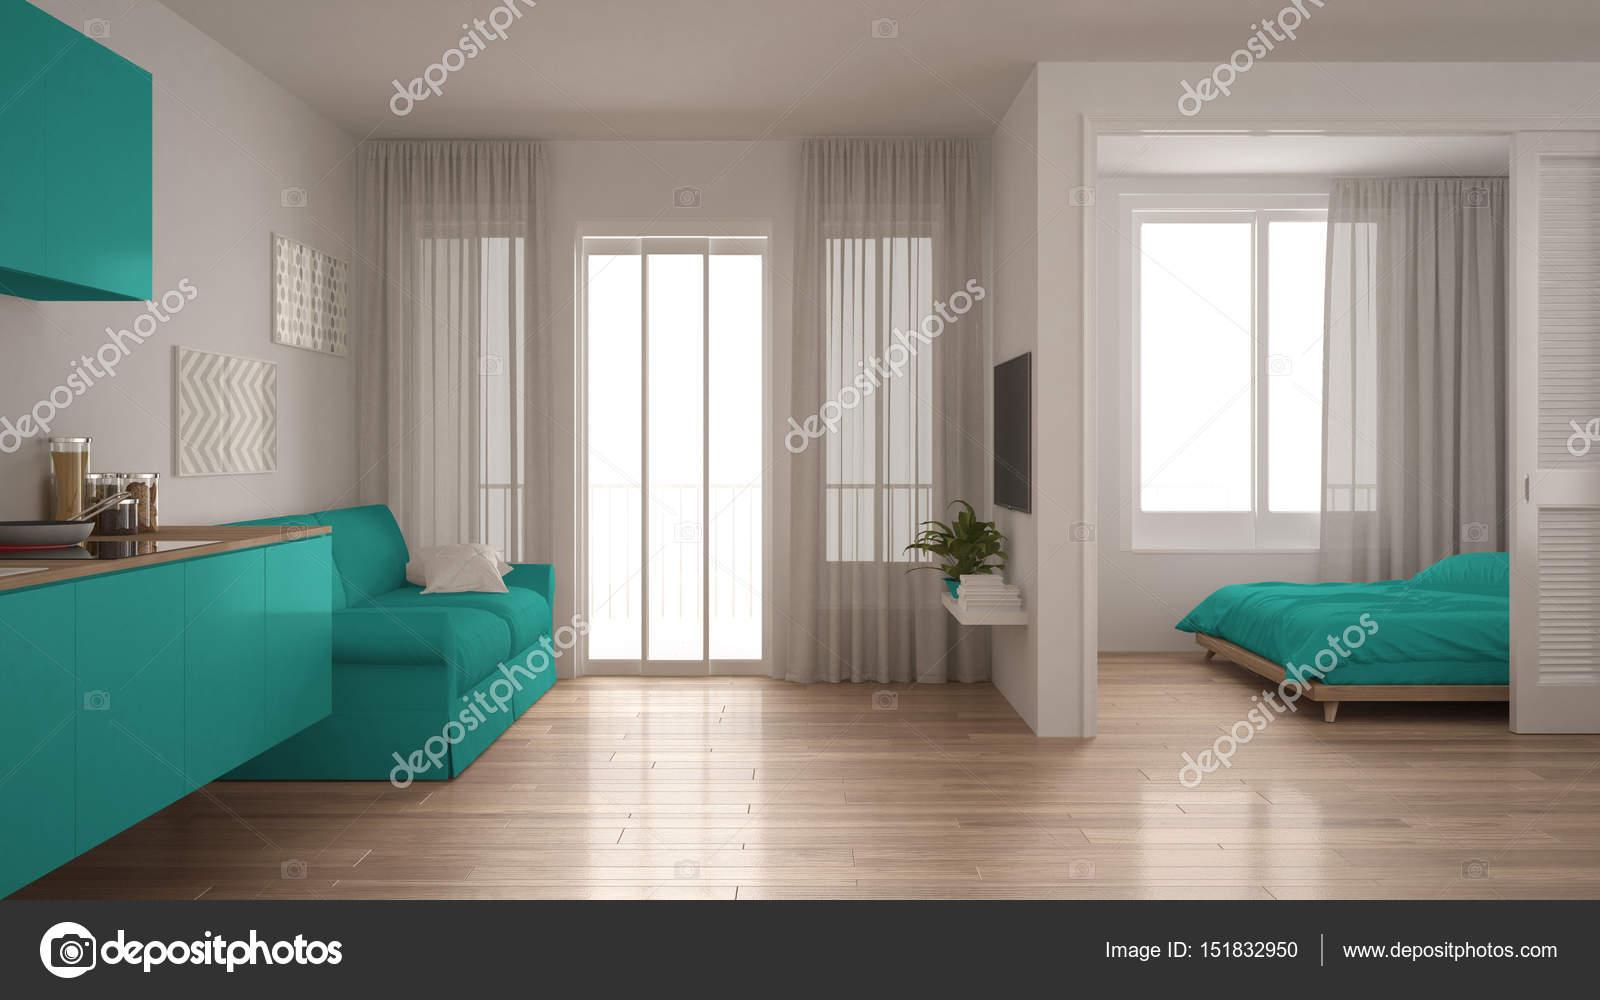 Woonkamer Klein Appartement : Klein appartement met keuken woonkamer en slaapkamer wit en